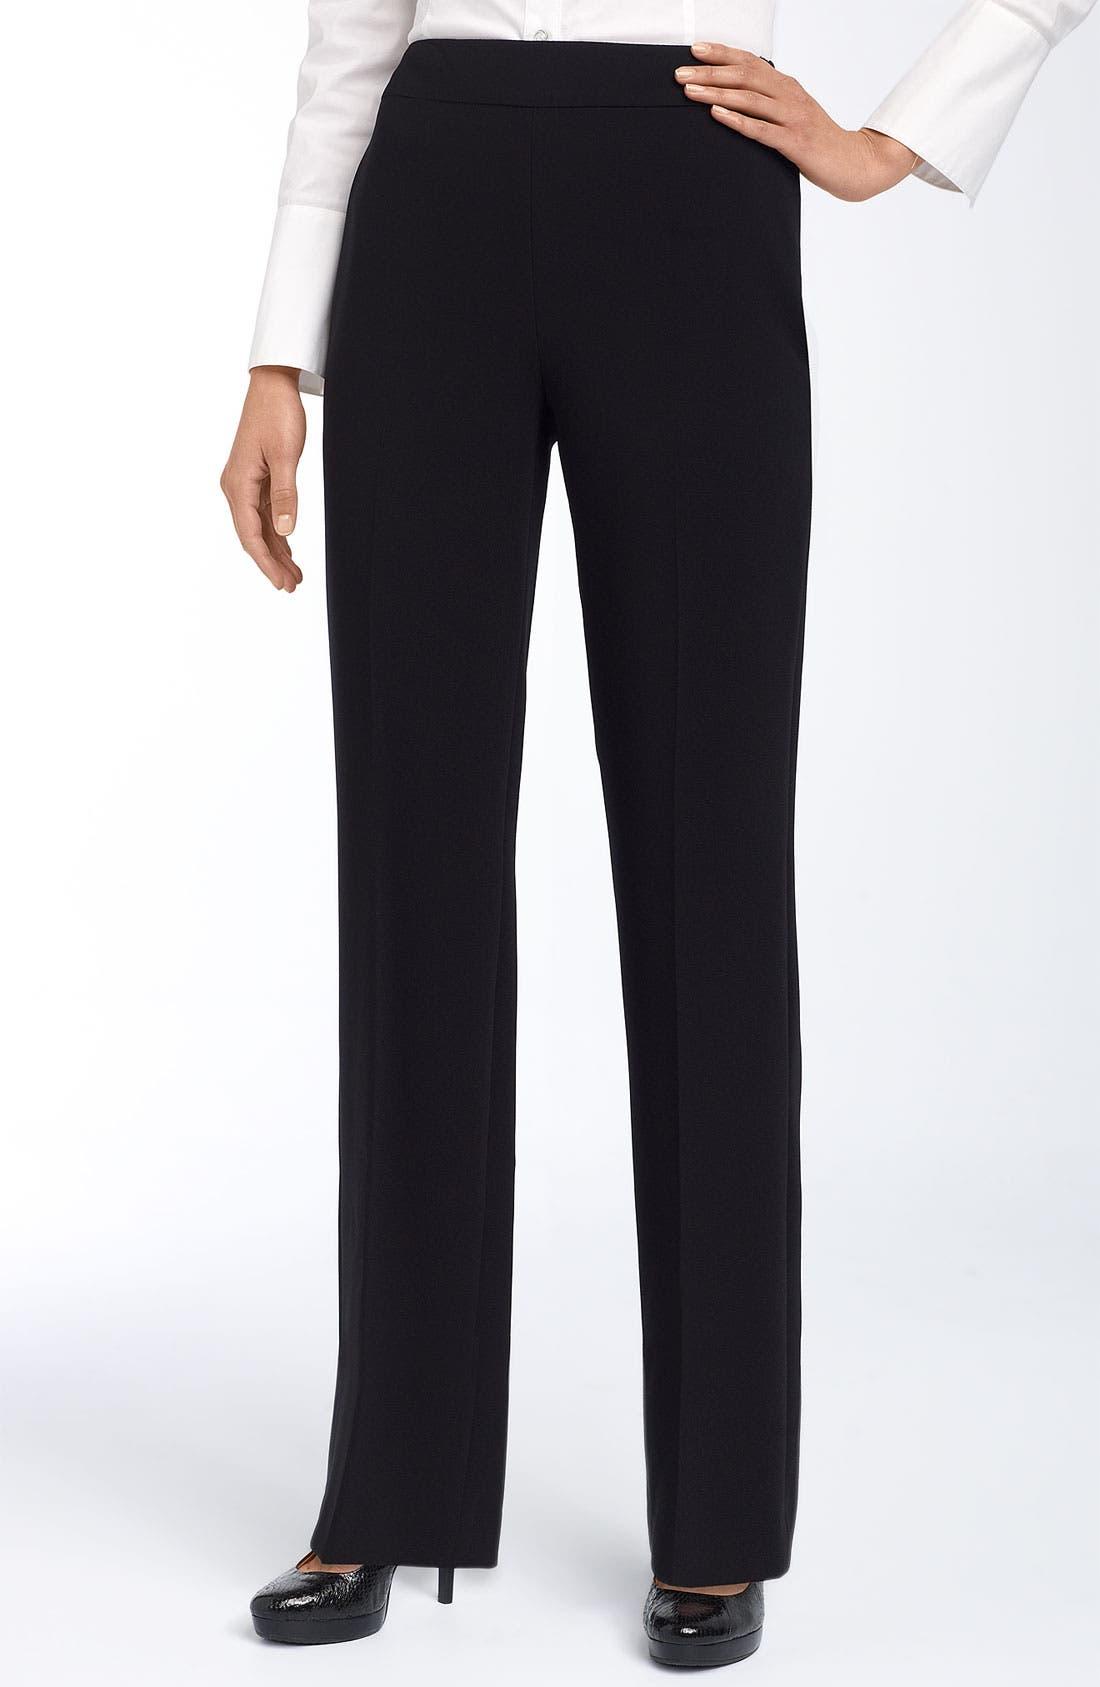 Alternate Image 1 Selected - Louben Side Zip Pants